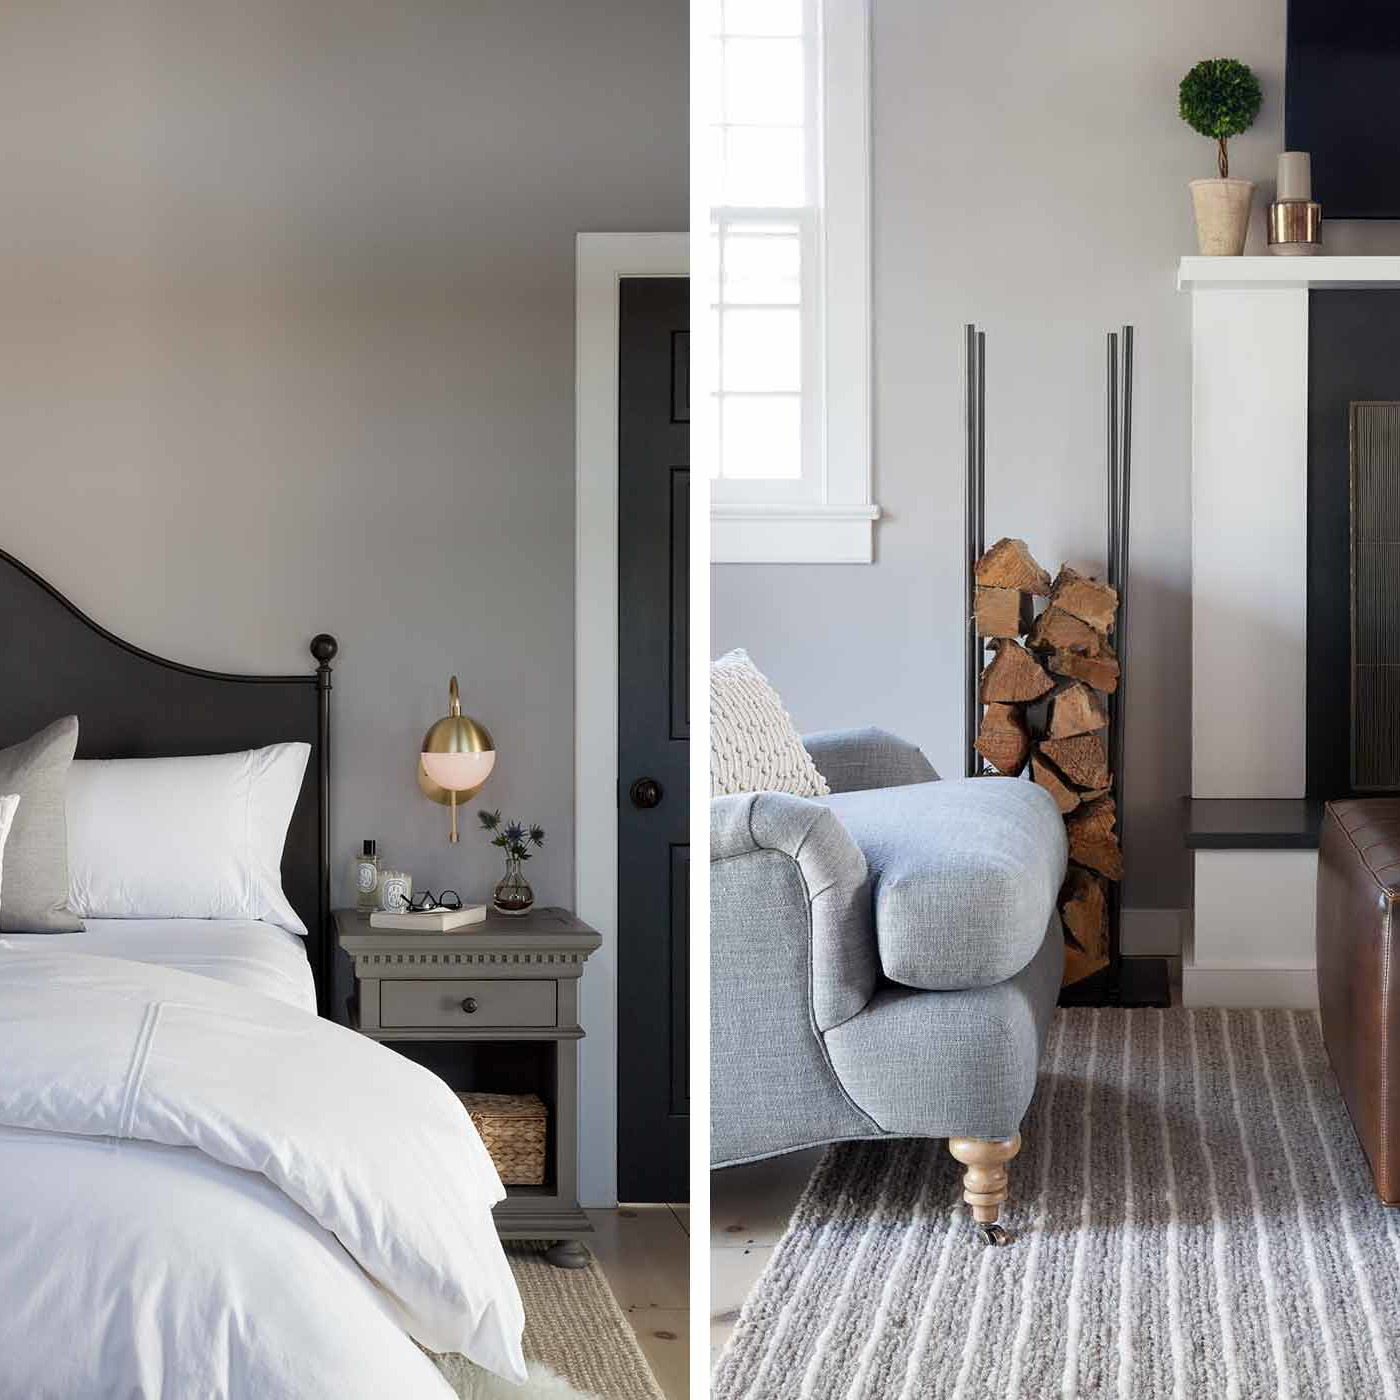 Bridgehampton beach house bedroom interior design